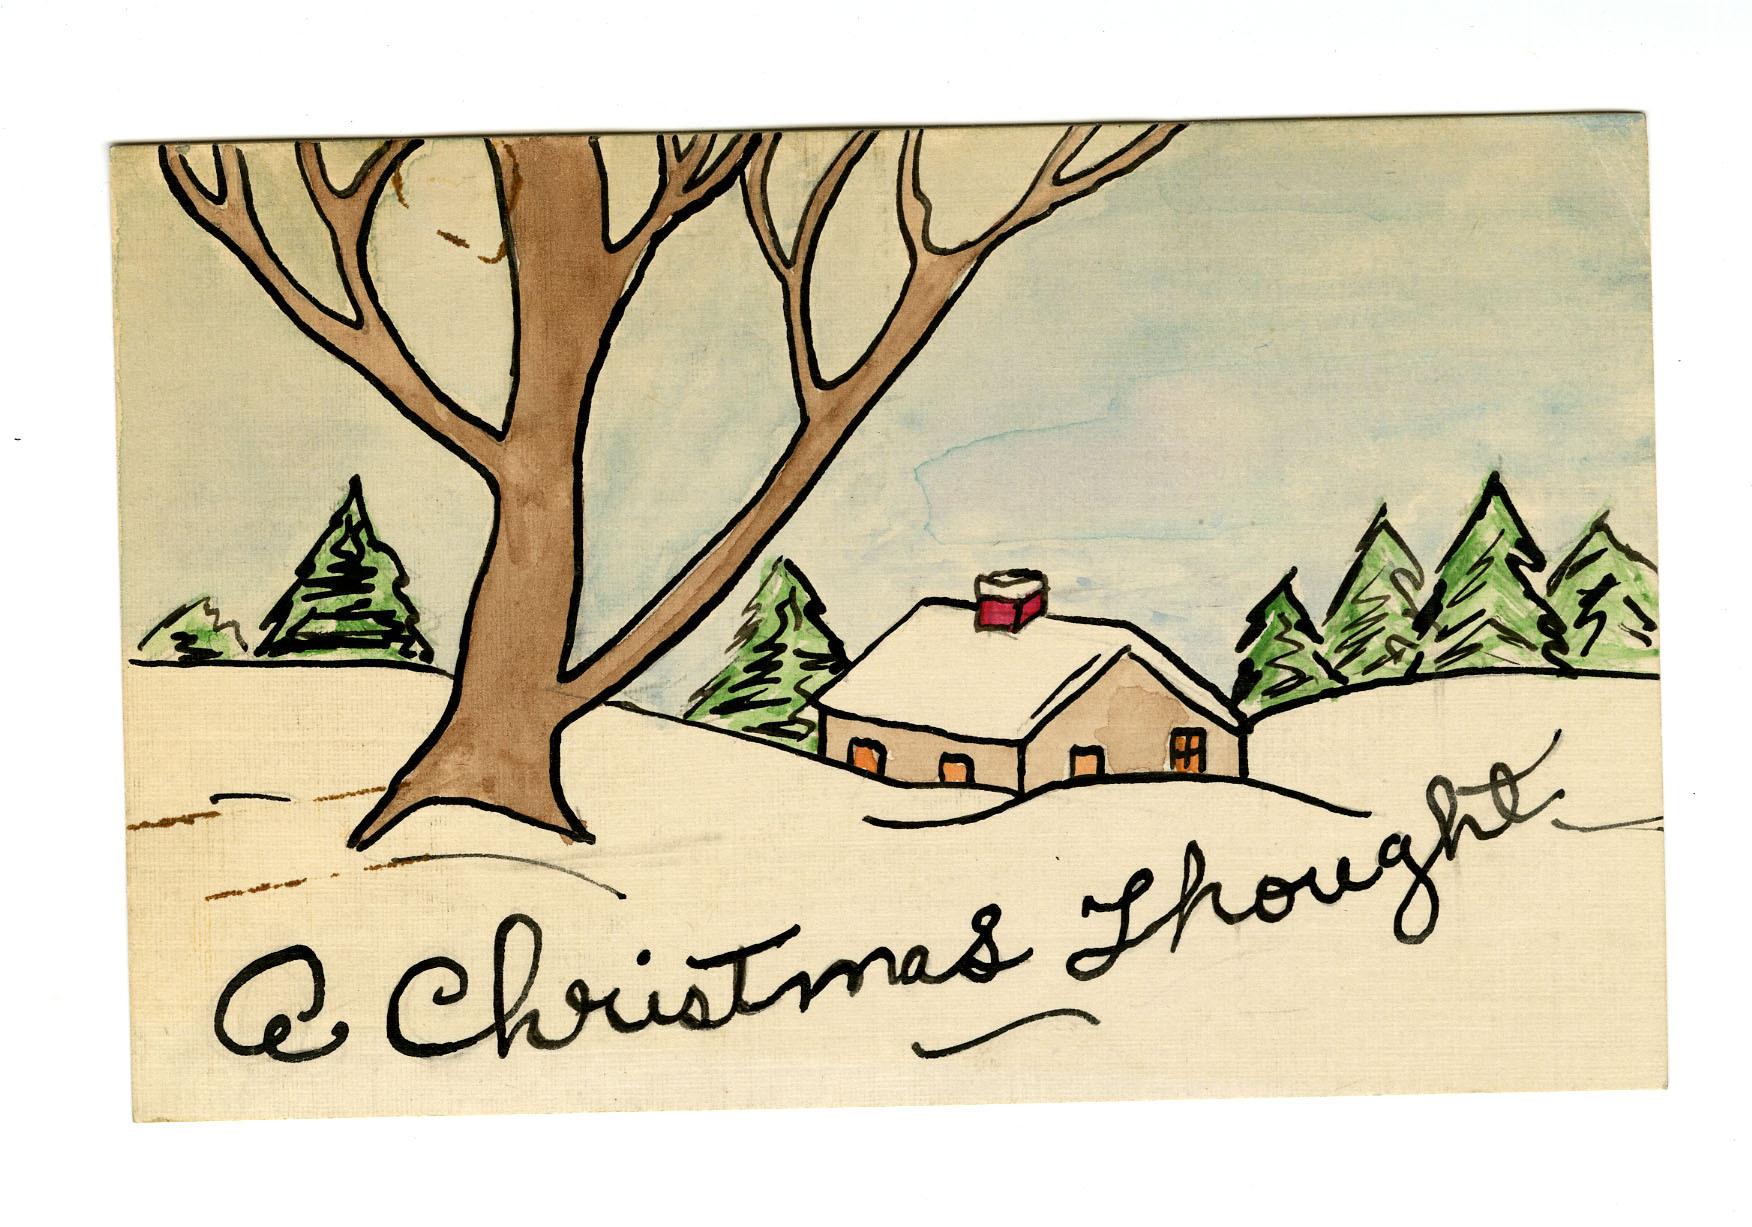 Ms1959_001_ChristmasCard_1931_p1.jpg